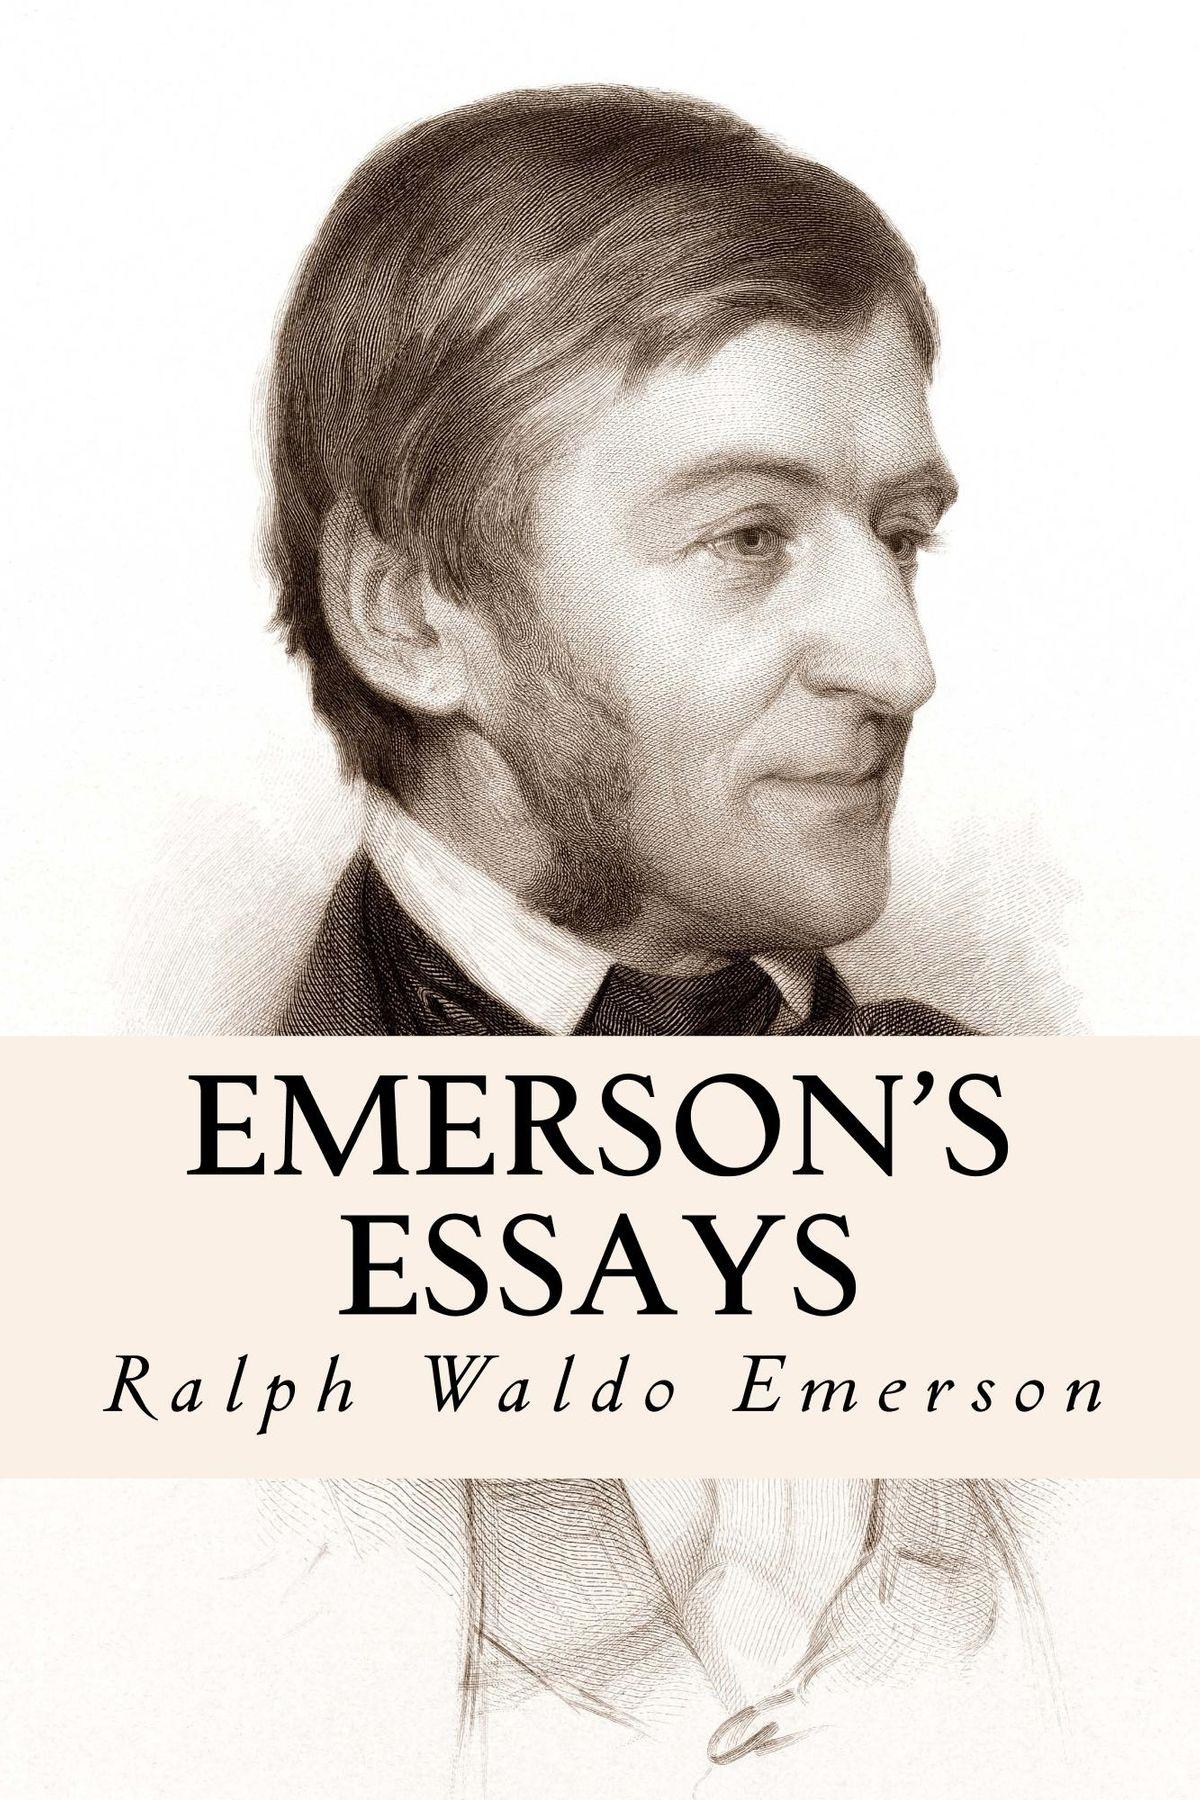 015 Emerson Essays S Essay Dreaded Ralph Pdf First Series Summary Waldo Nature Full